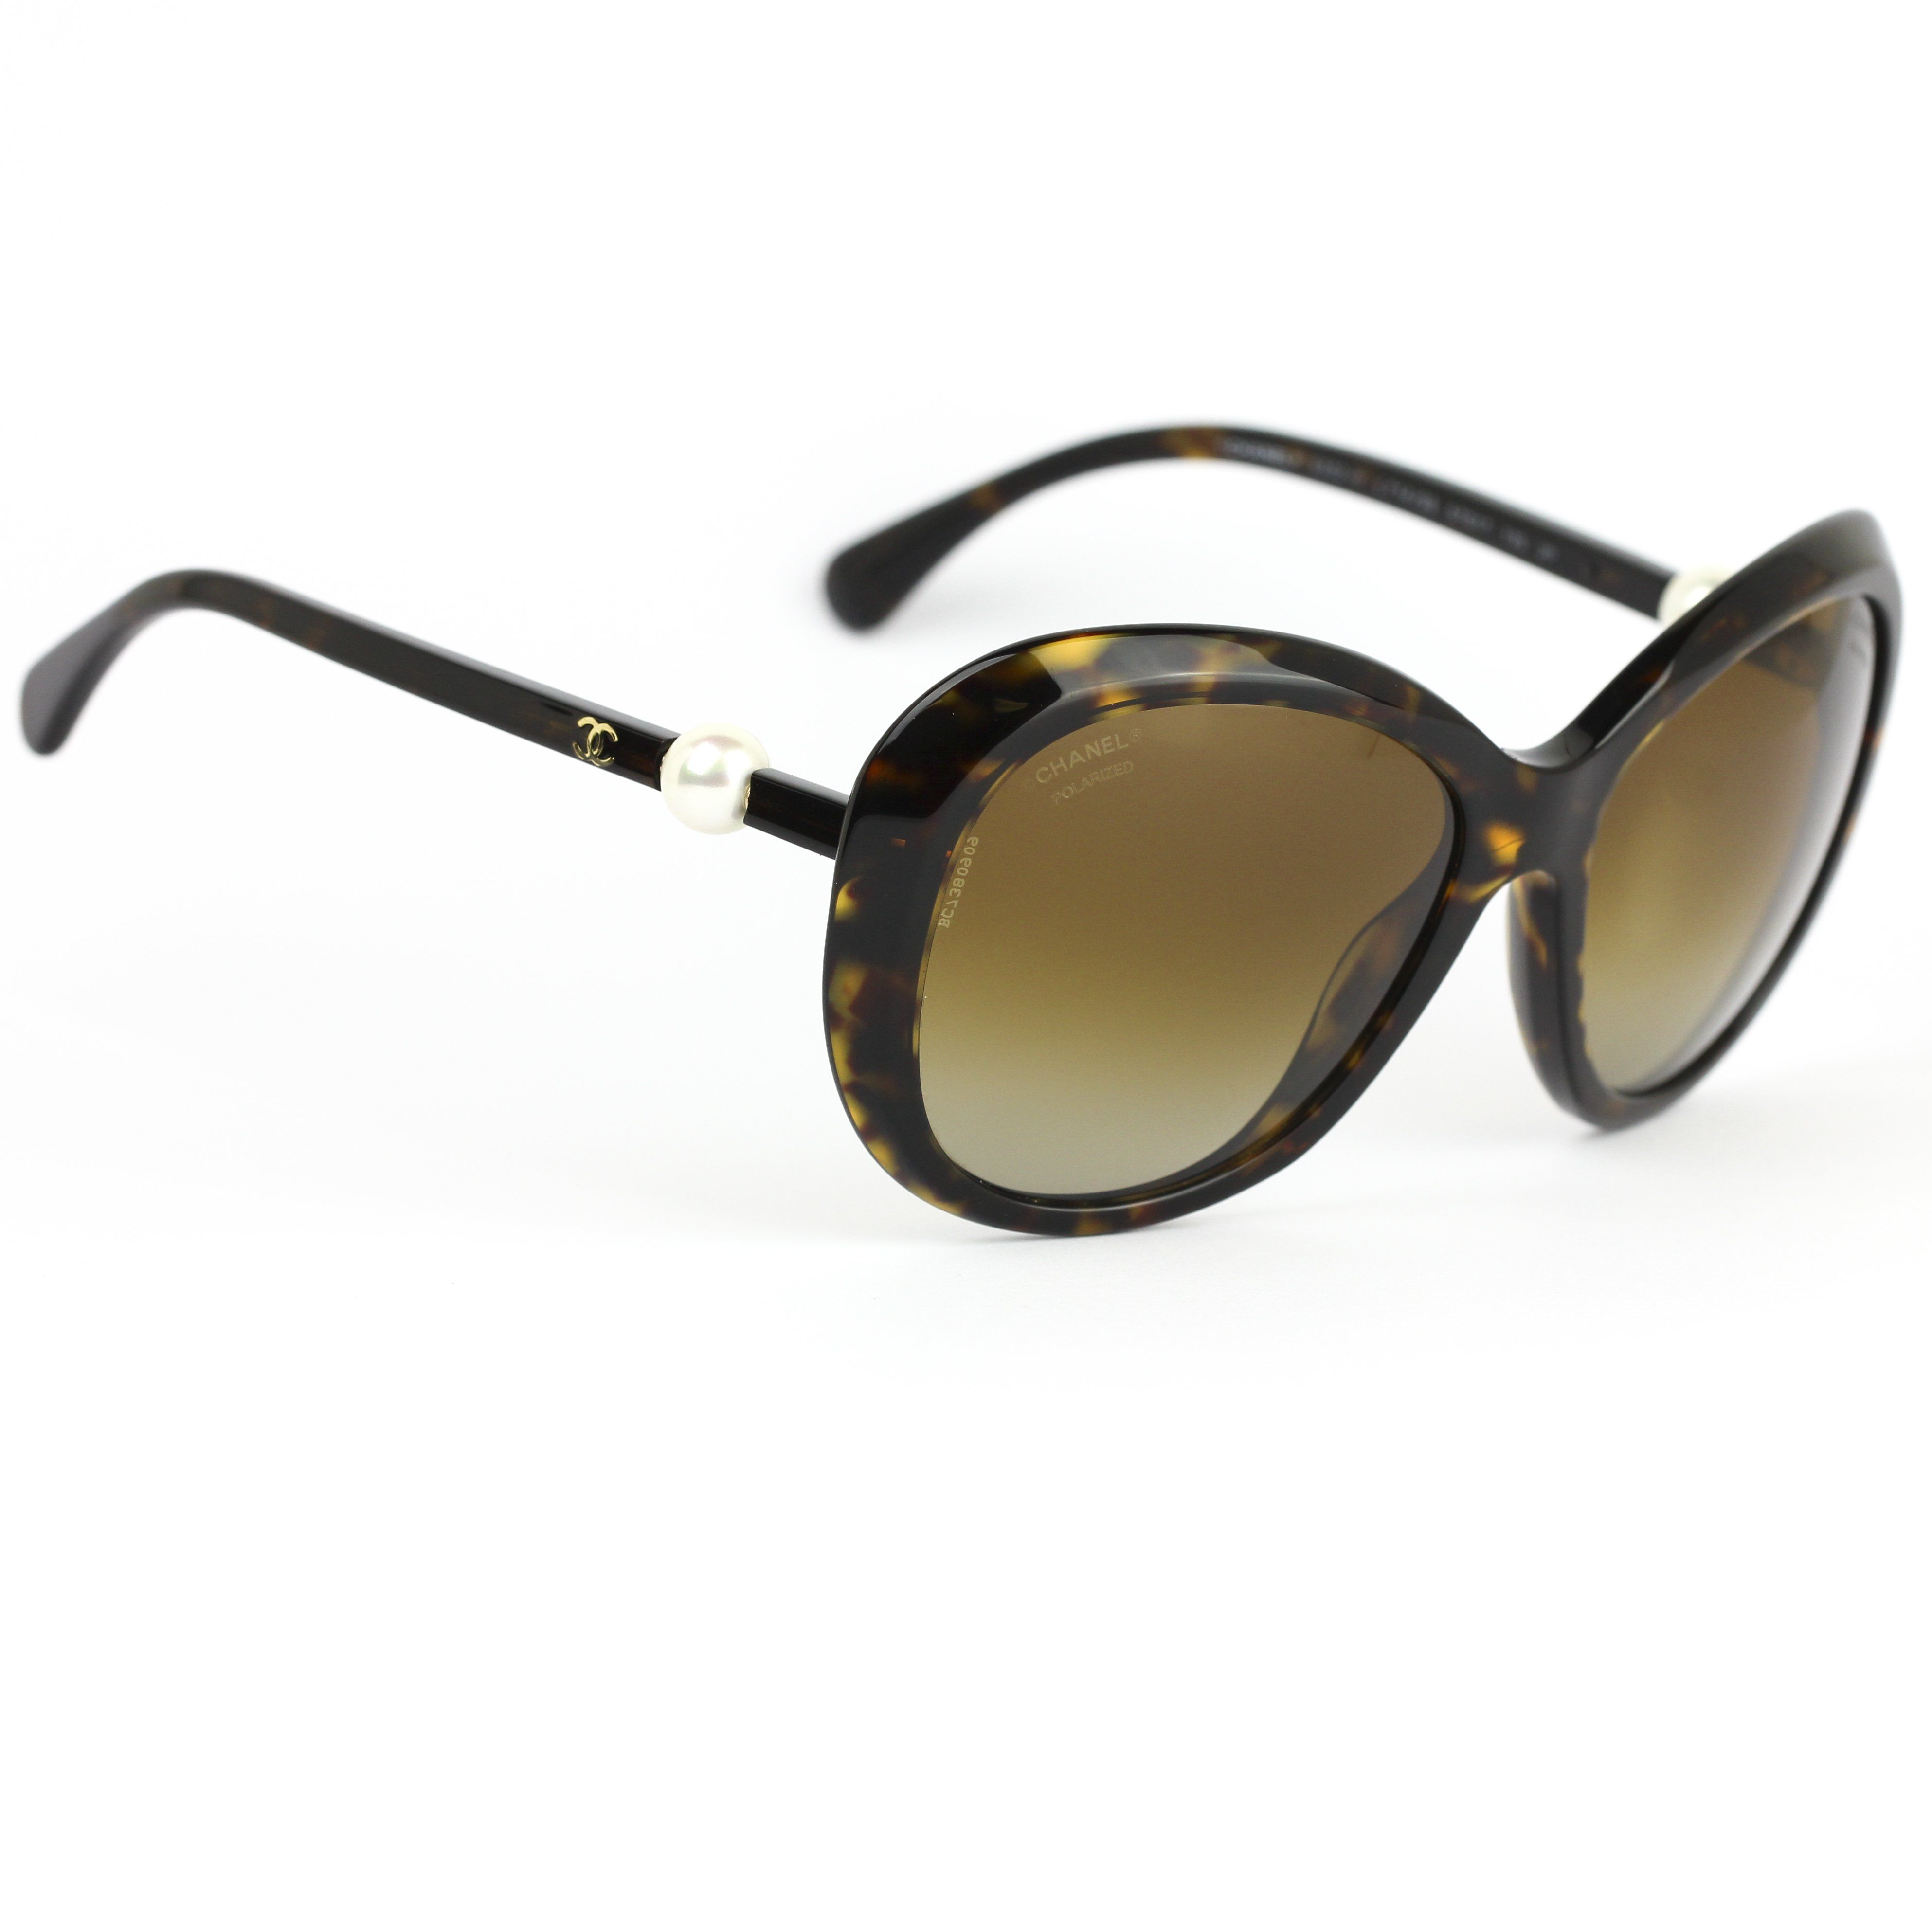 95593317f7a Chanel 5302 H Pearl Sunglasses Dark Tortoise Frame